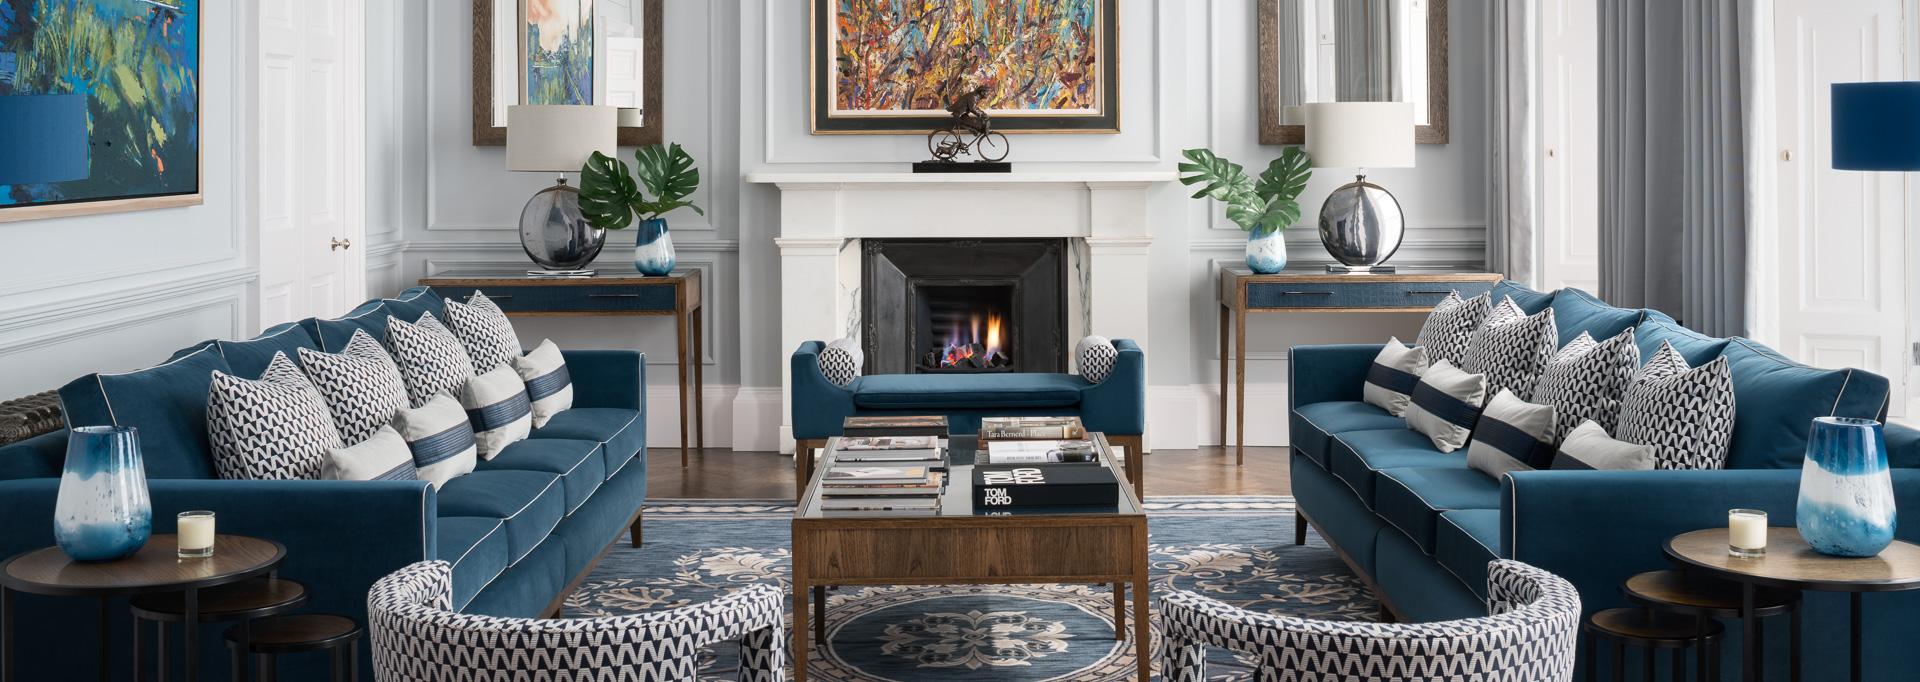 herriot row zac and zac blue livingroom decor